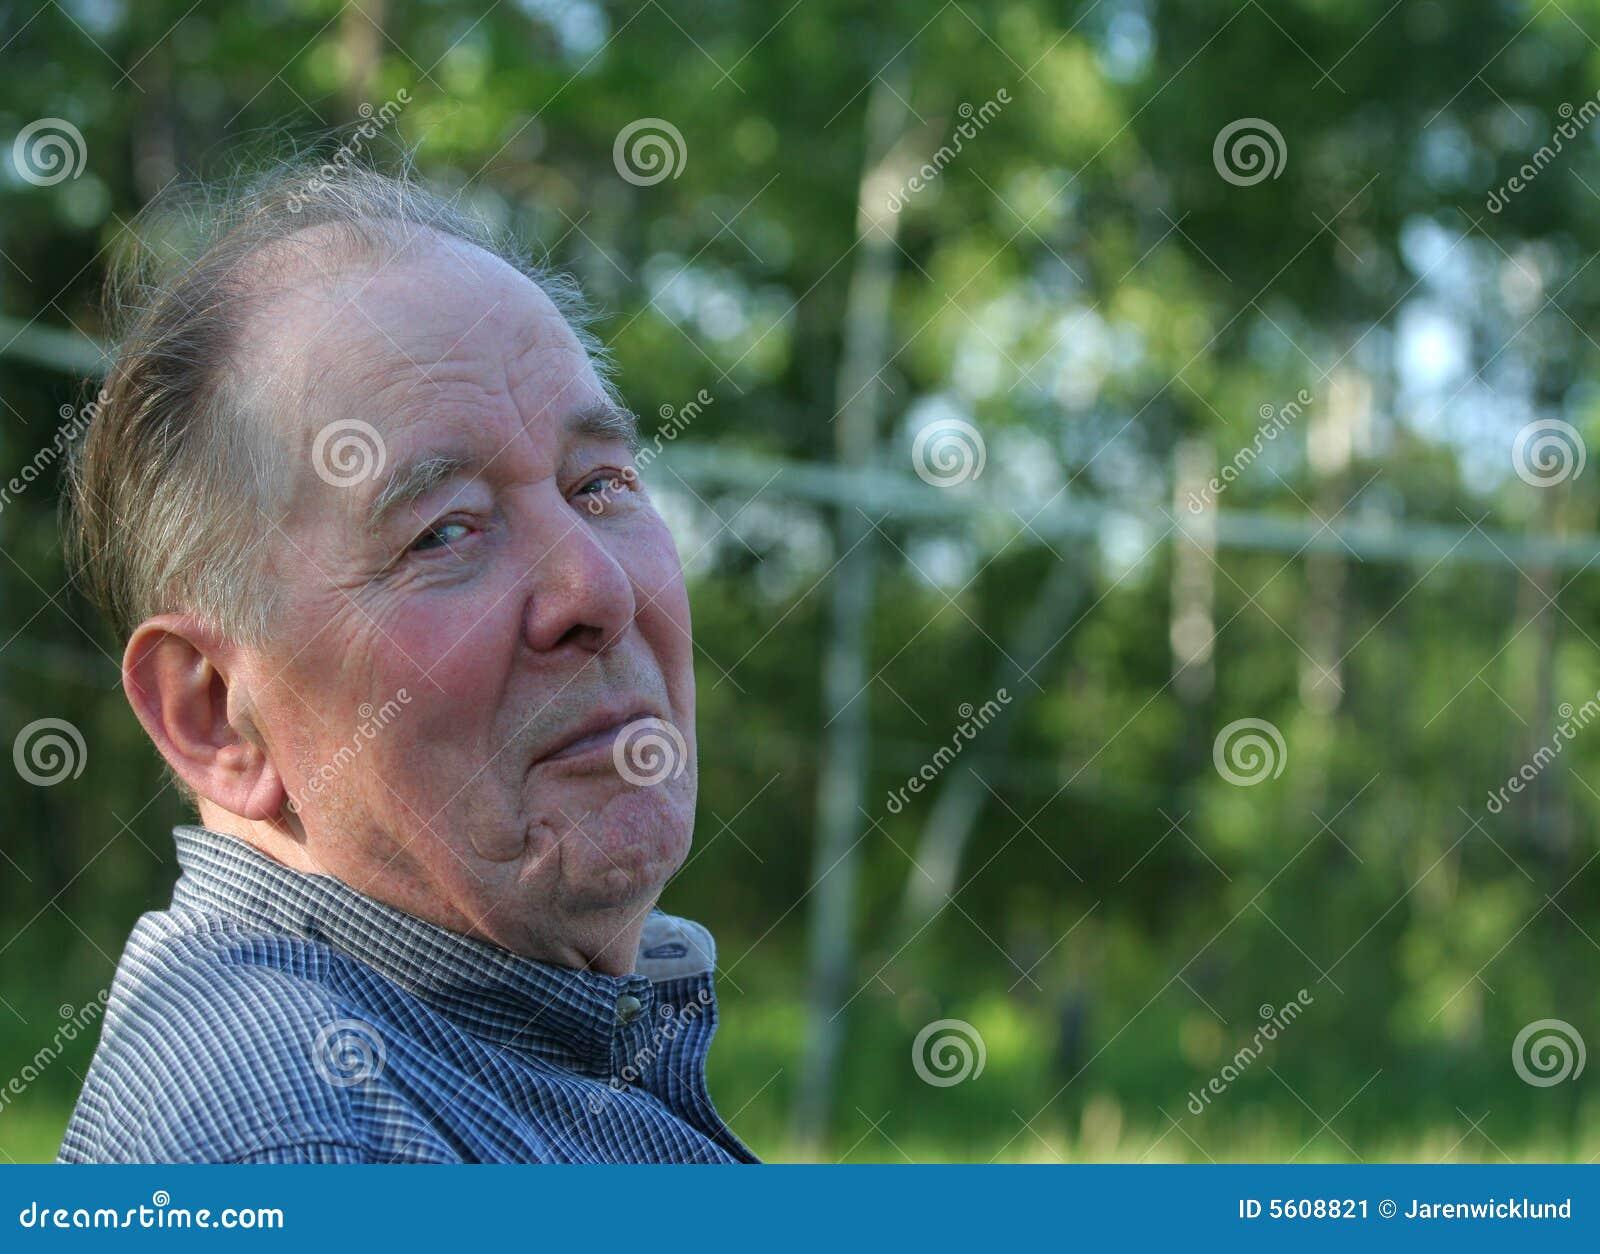 7753004658a Stock Image  Elderly Man Enjoying Outdoors Picture. Image  5608821